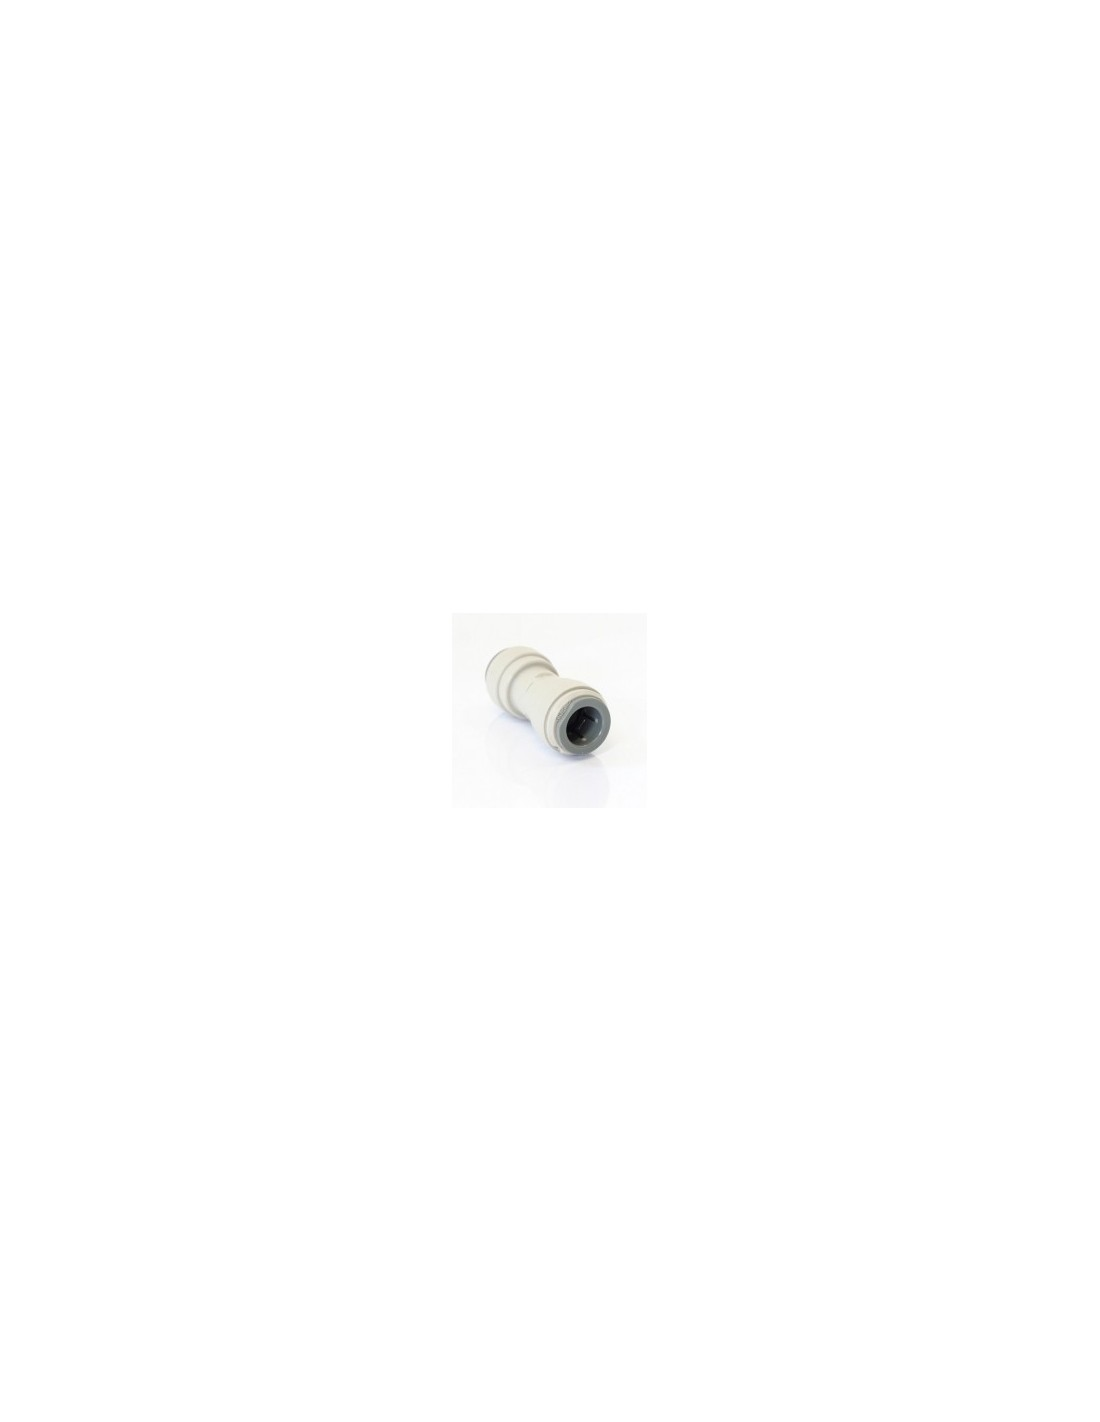 "SPO00355 - JG rak 12,7x12,7 mm (1/2"") (pi0416s)"